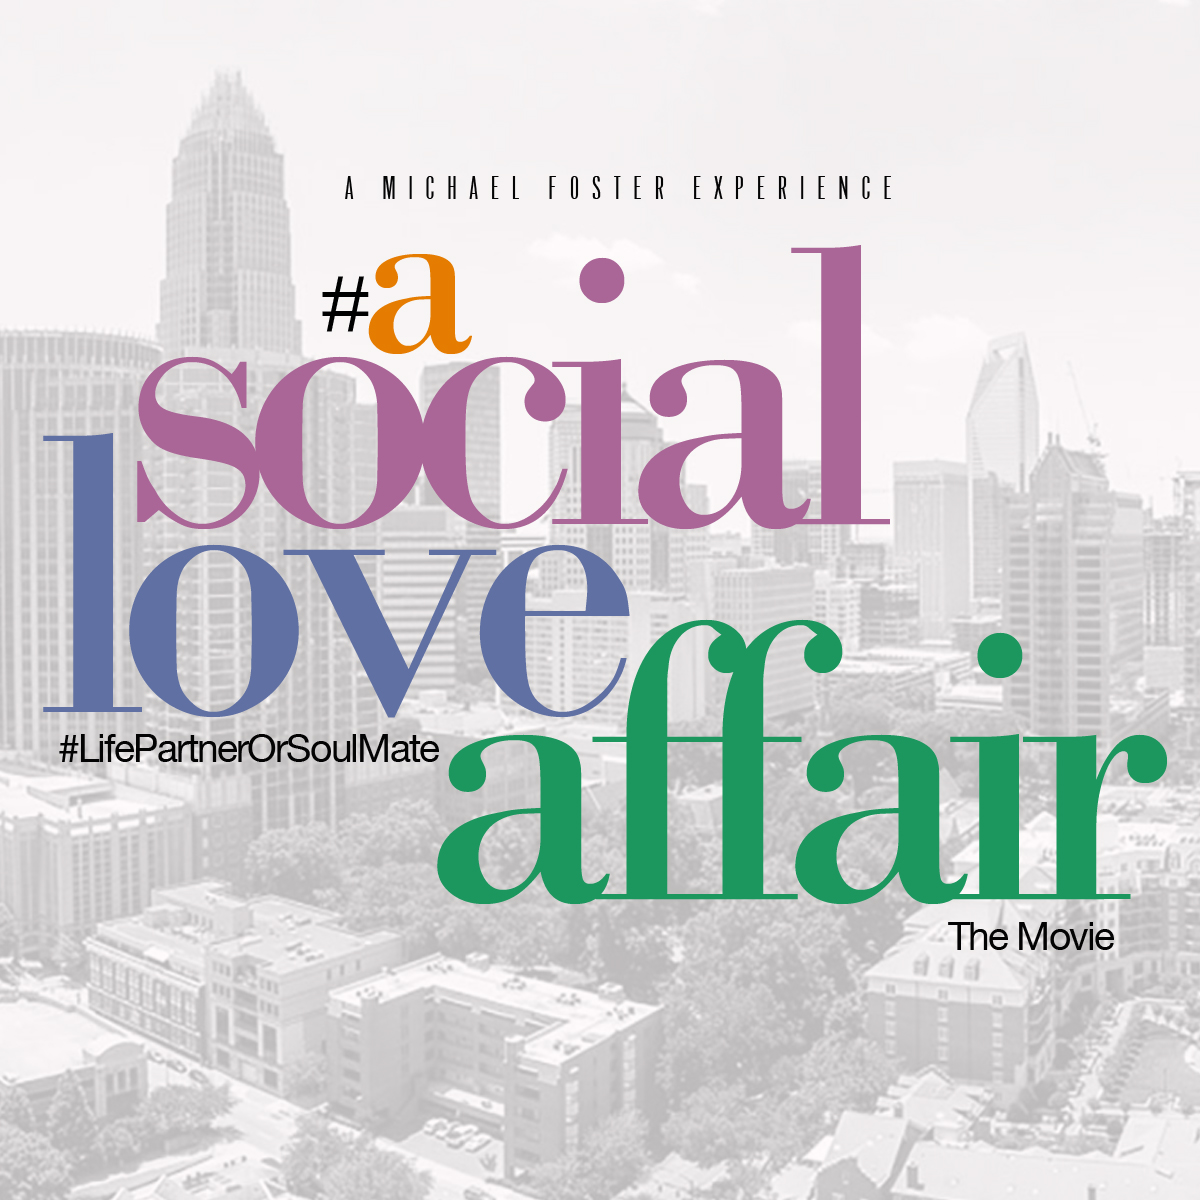 #aSocialLoveAffair flyer